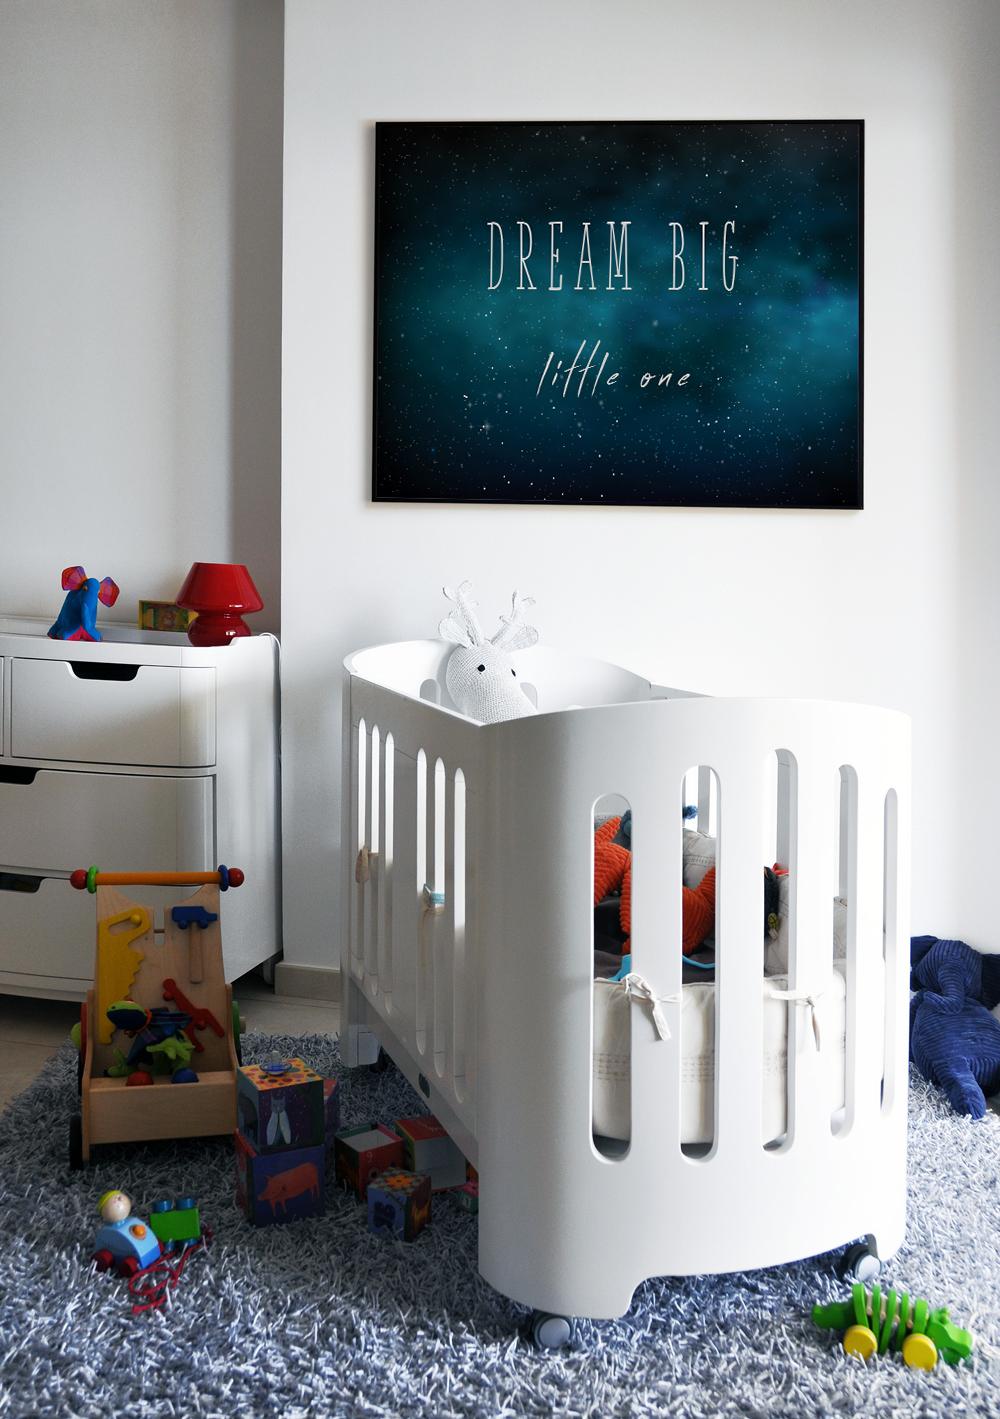 Space Nursery Decor, Nursery Prints Boy, Dream Big example image 2